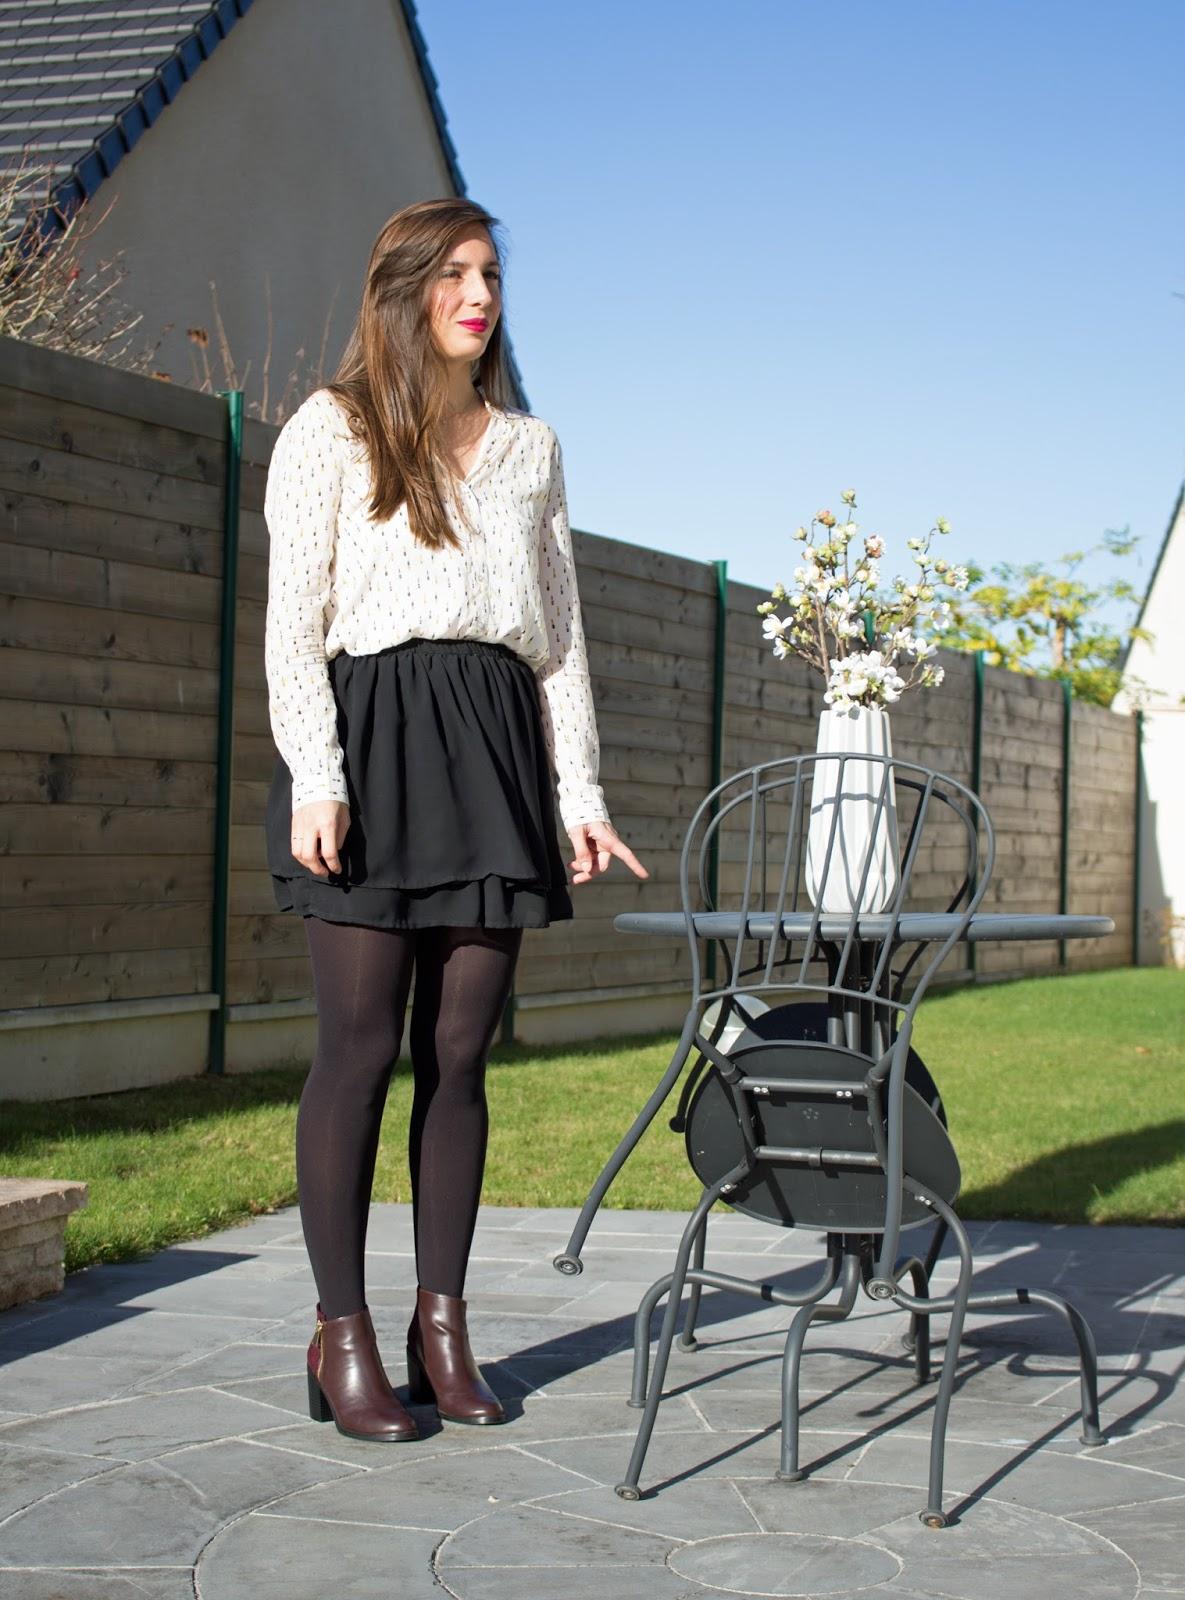 Street style legwear looks jenychooz.com - Fashionmylegs